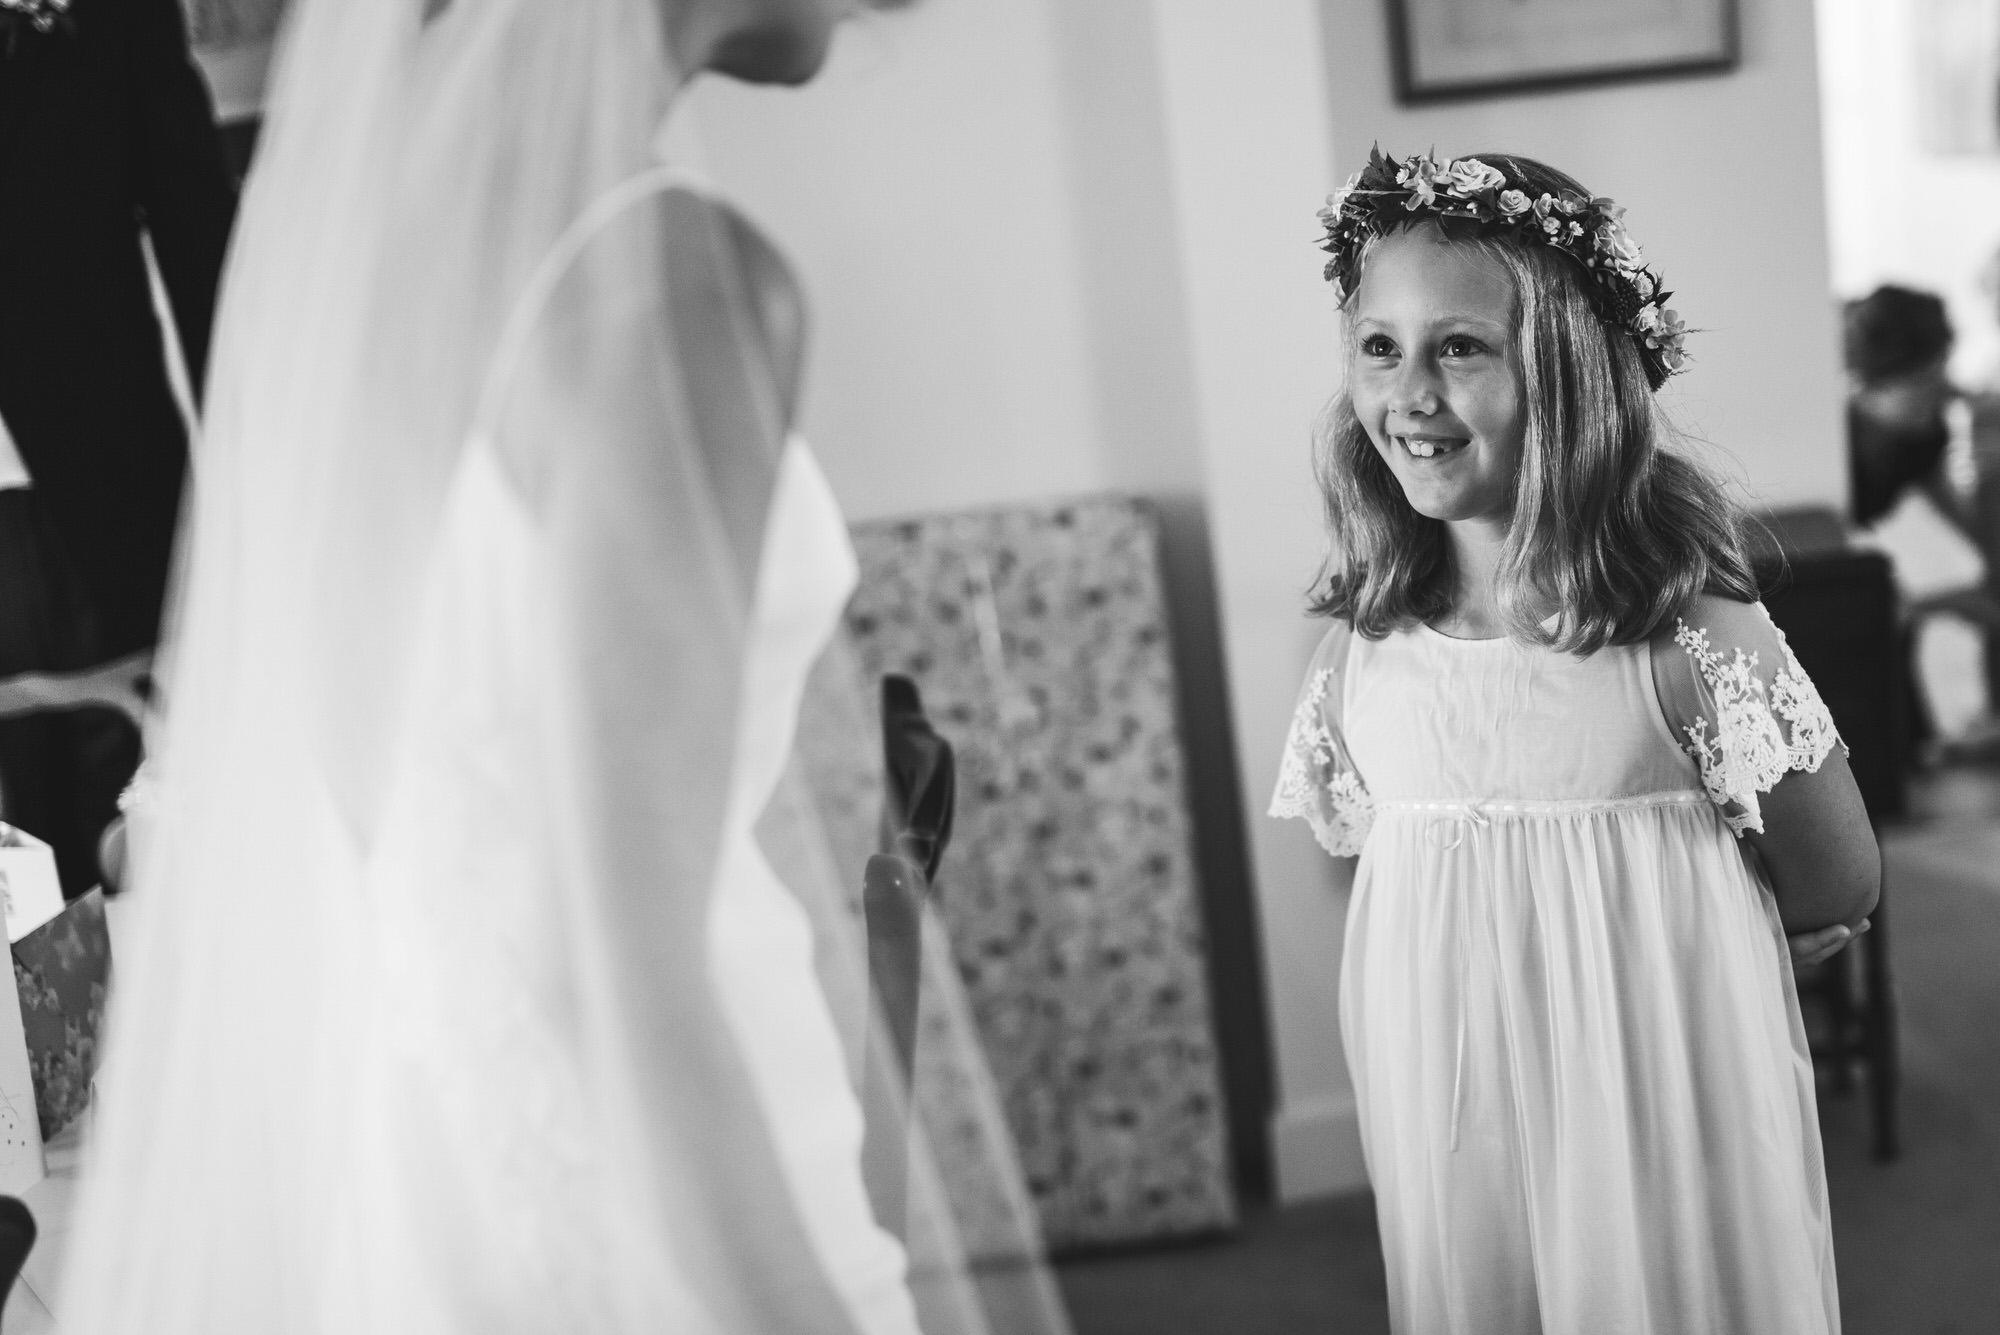 Dorset marquee wedding by the sea simon biffen photography 10